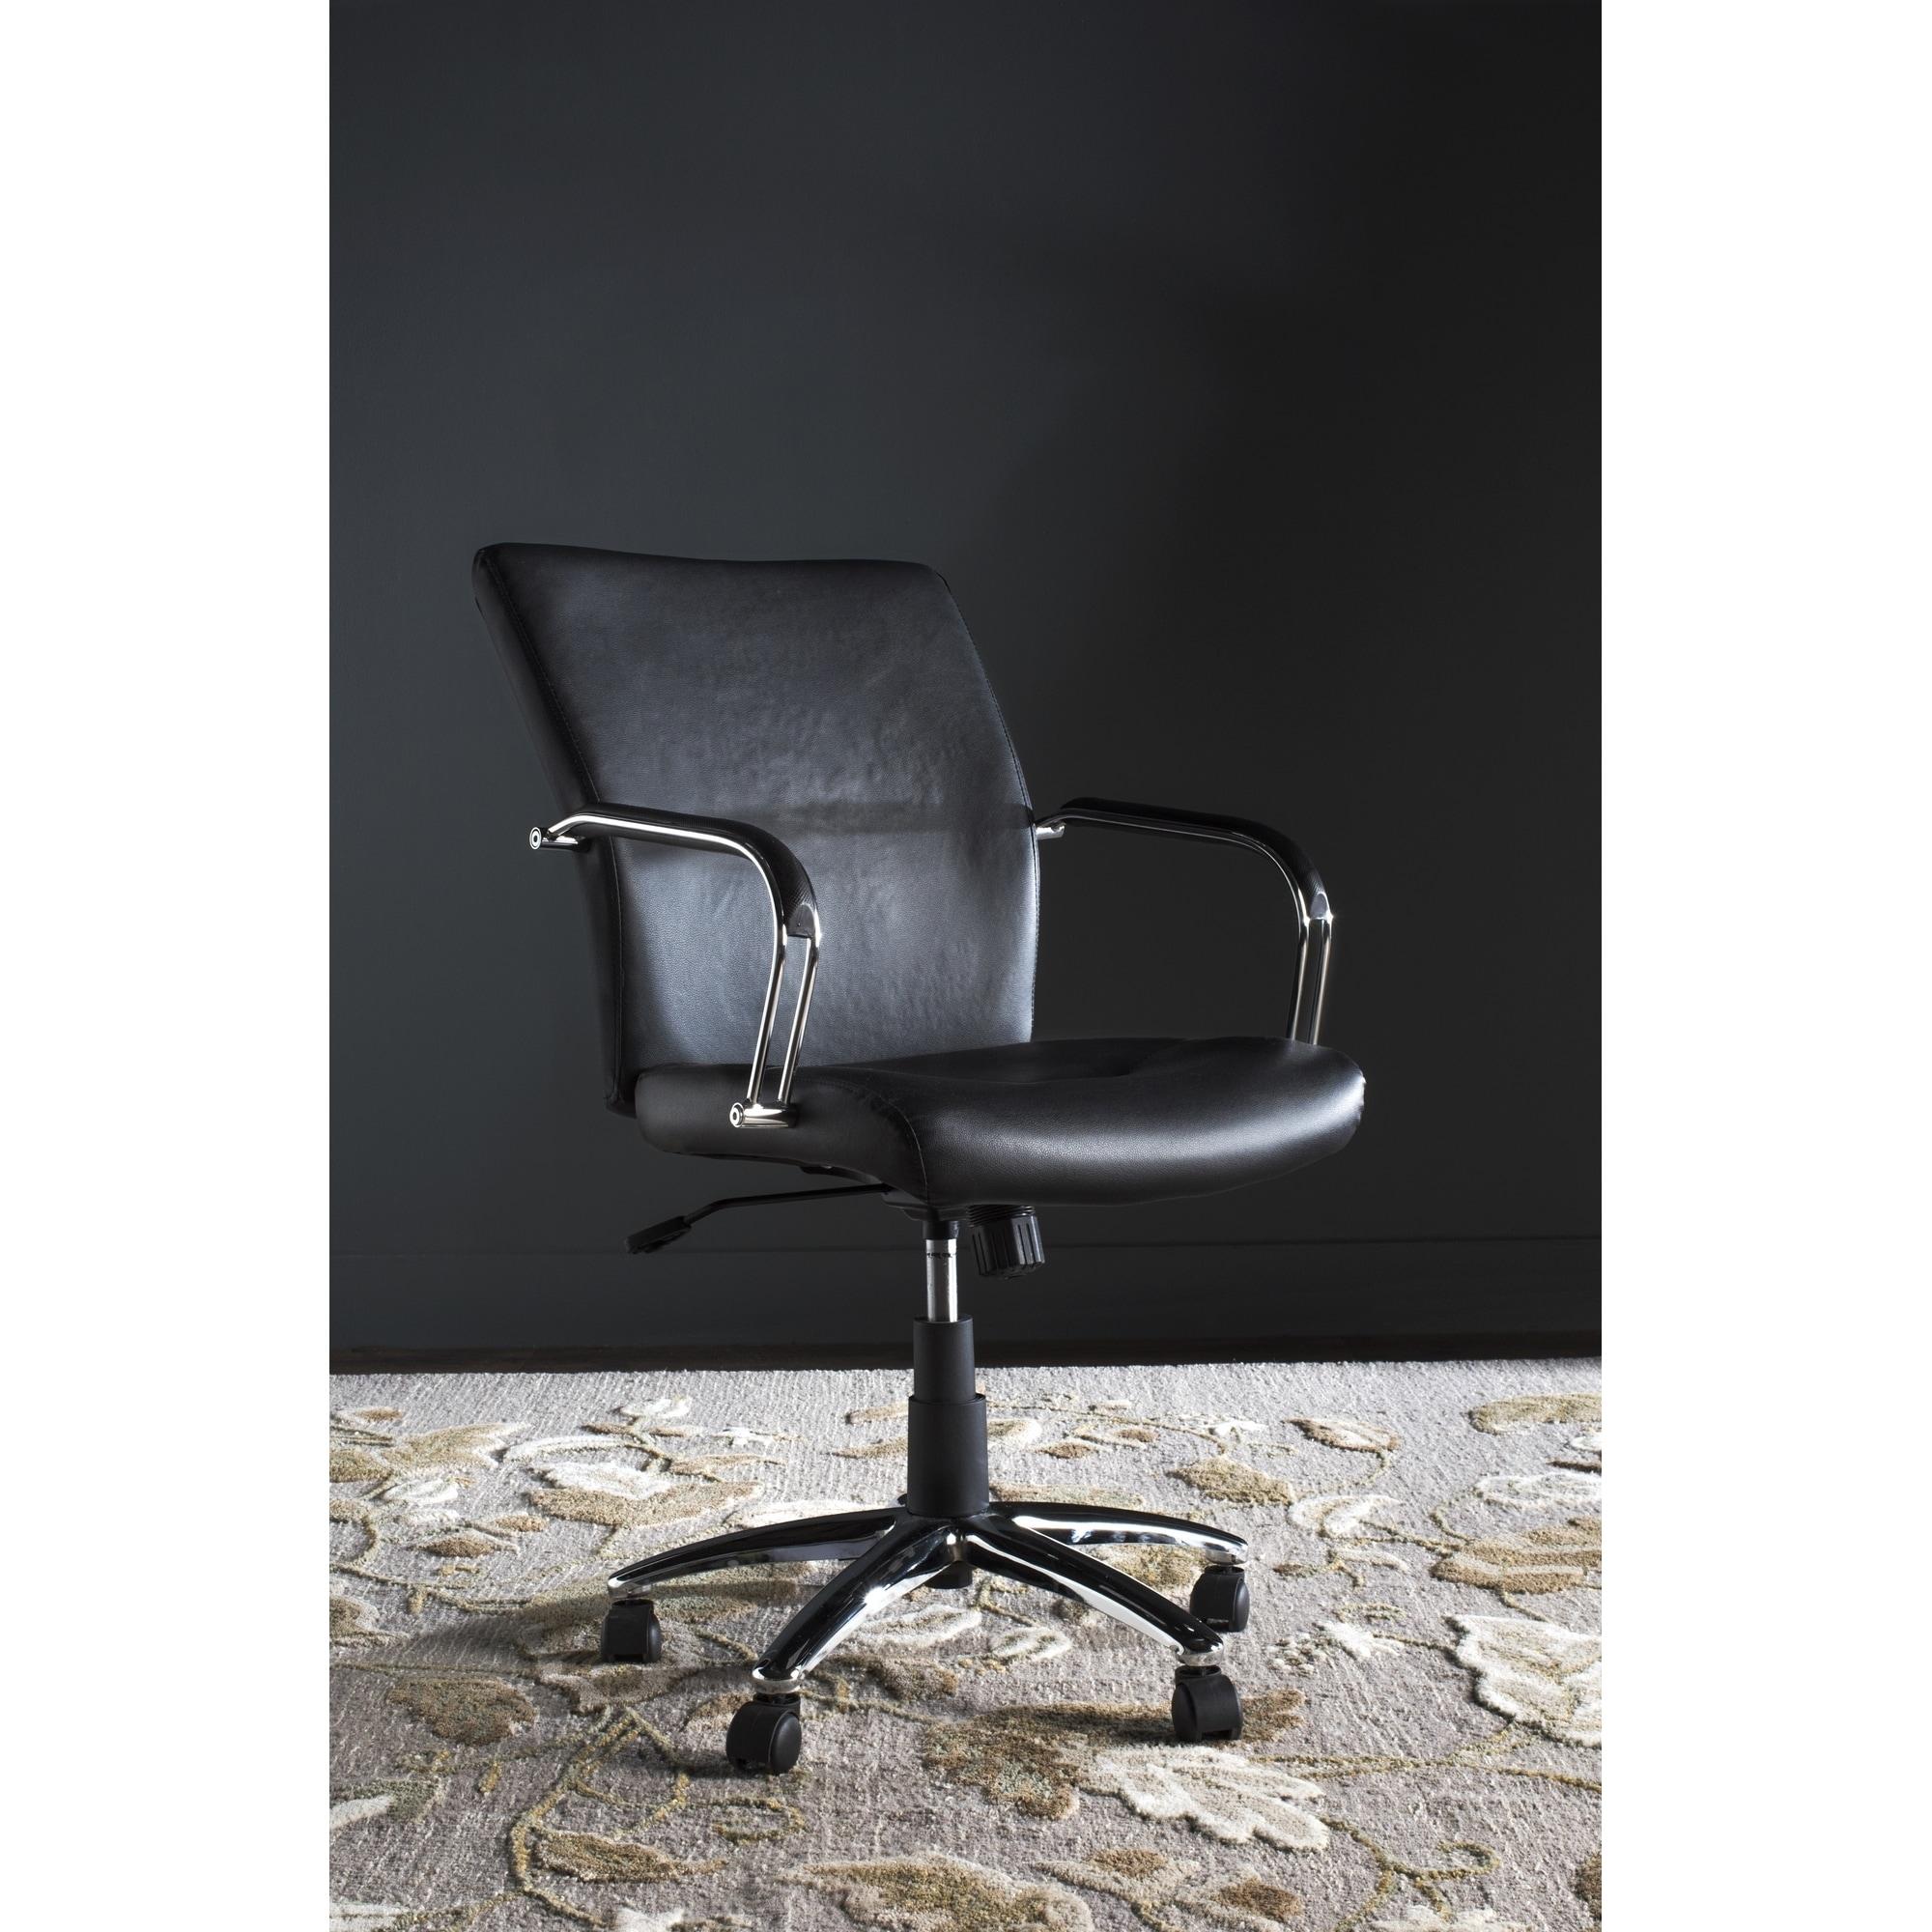 Clay Alder Home Onion Creek Adjustable Swivel Black Desk Chair